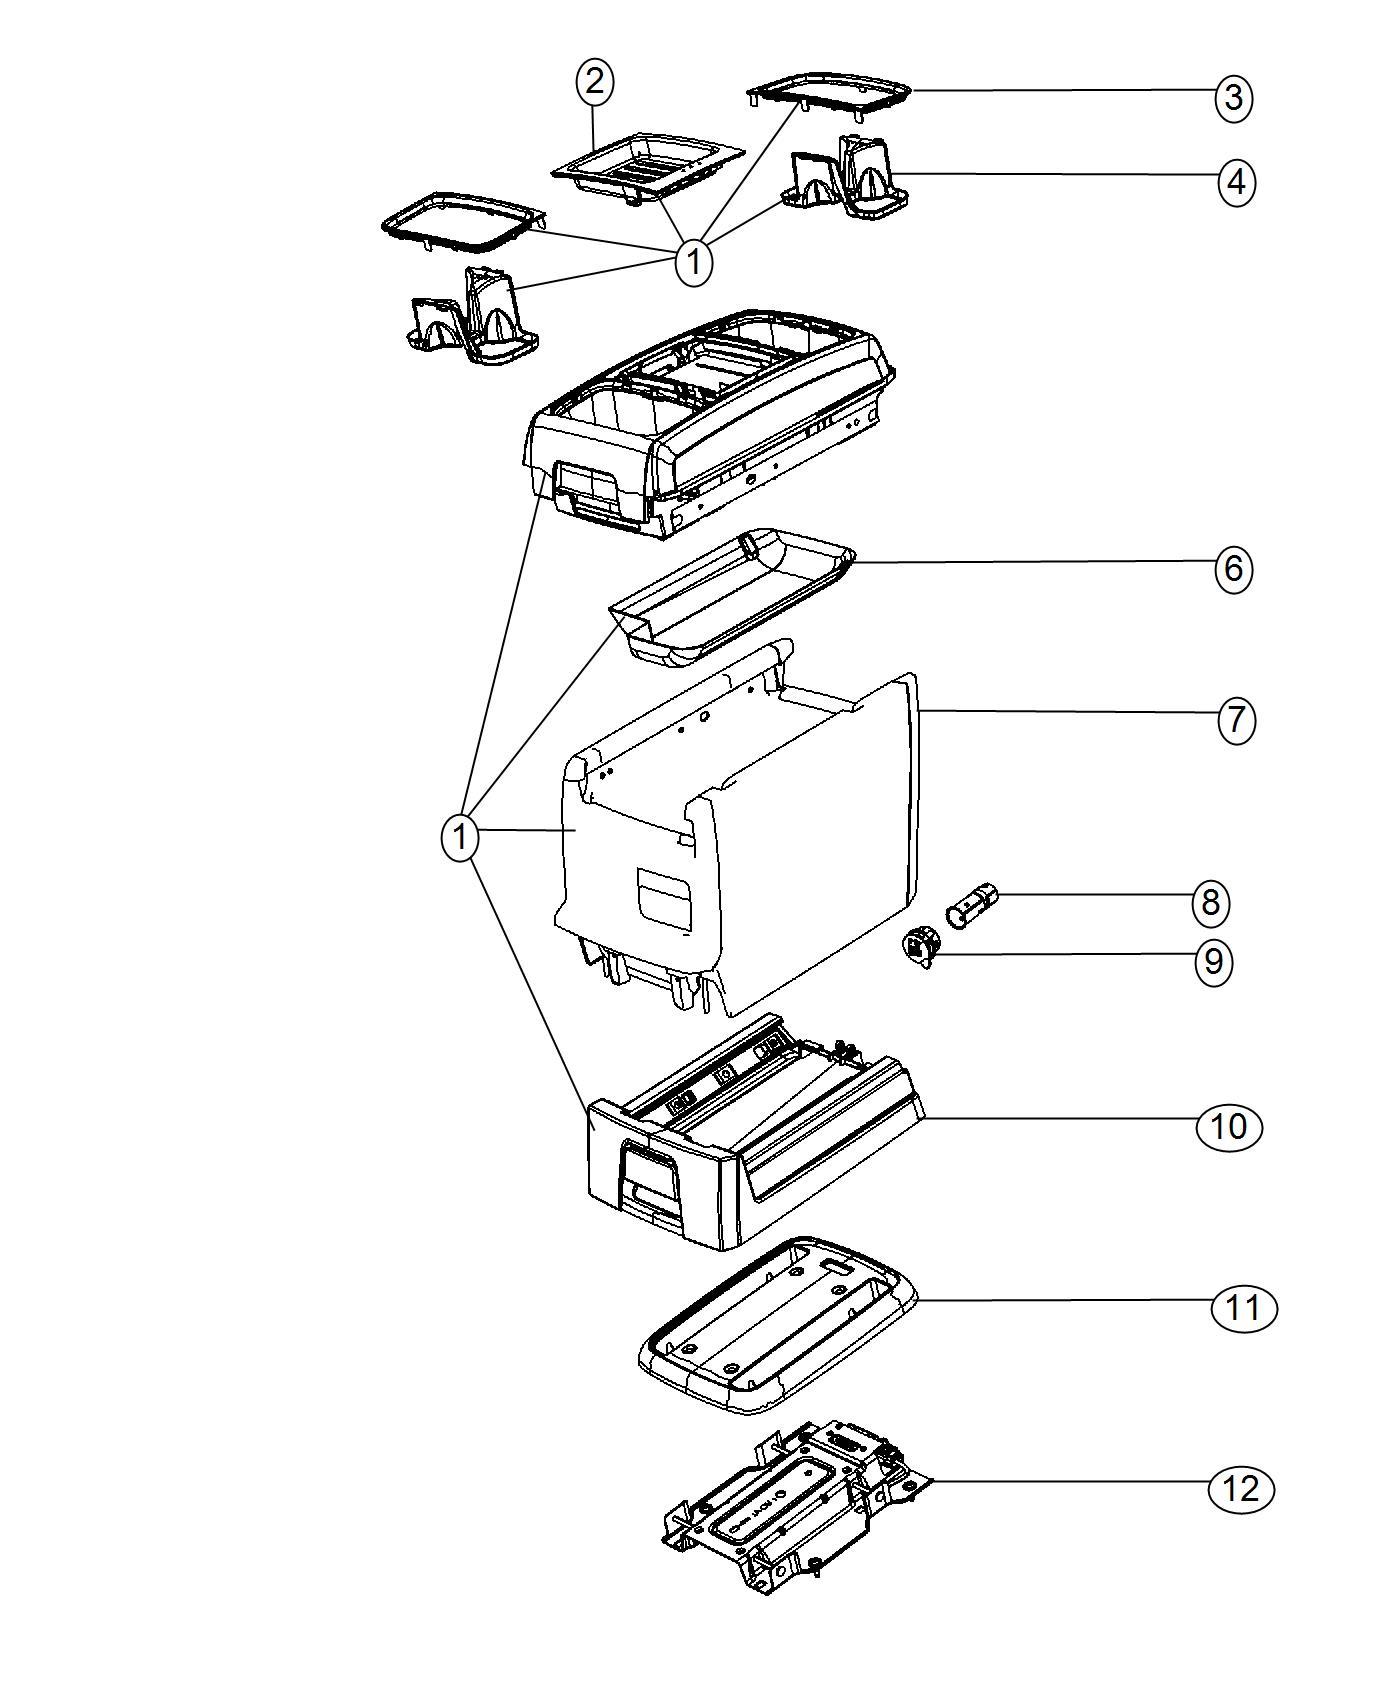 2016 Dodge Grand Caravan Mat. Storage tray. [removable